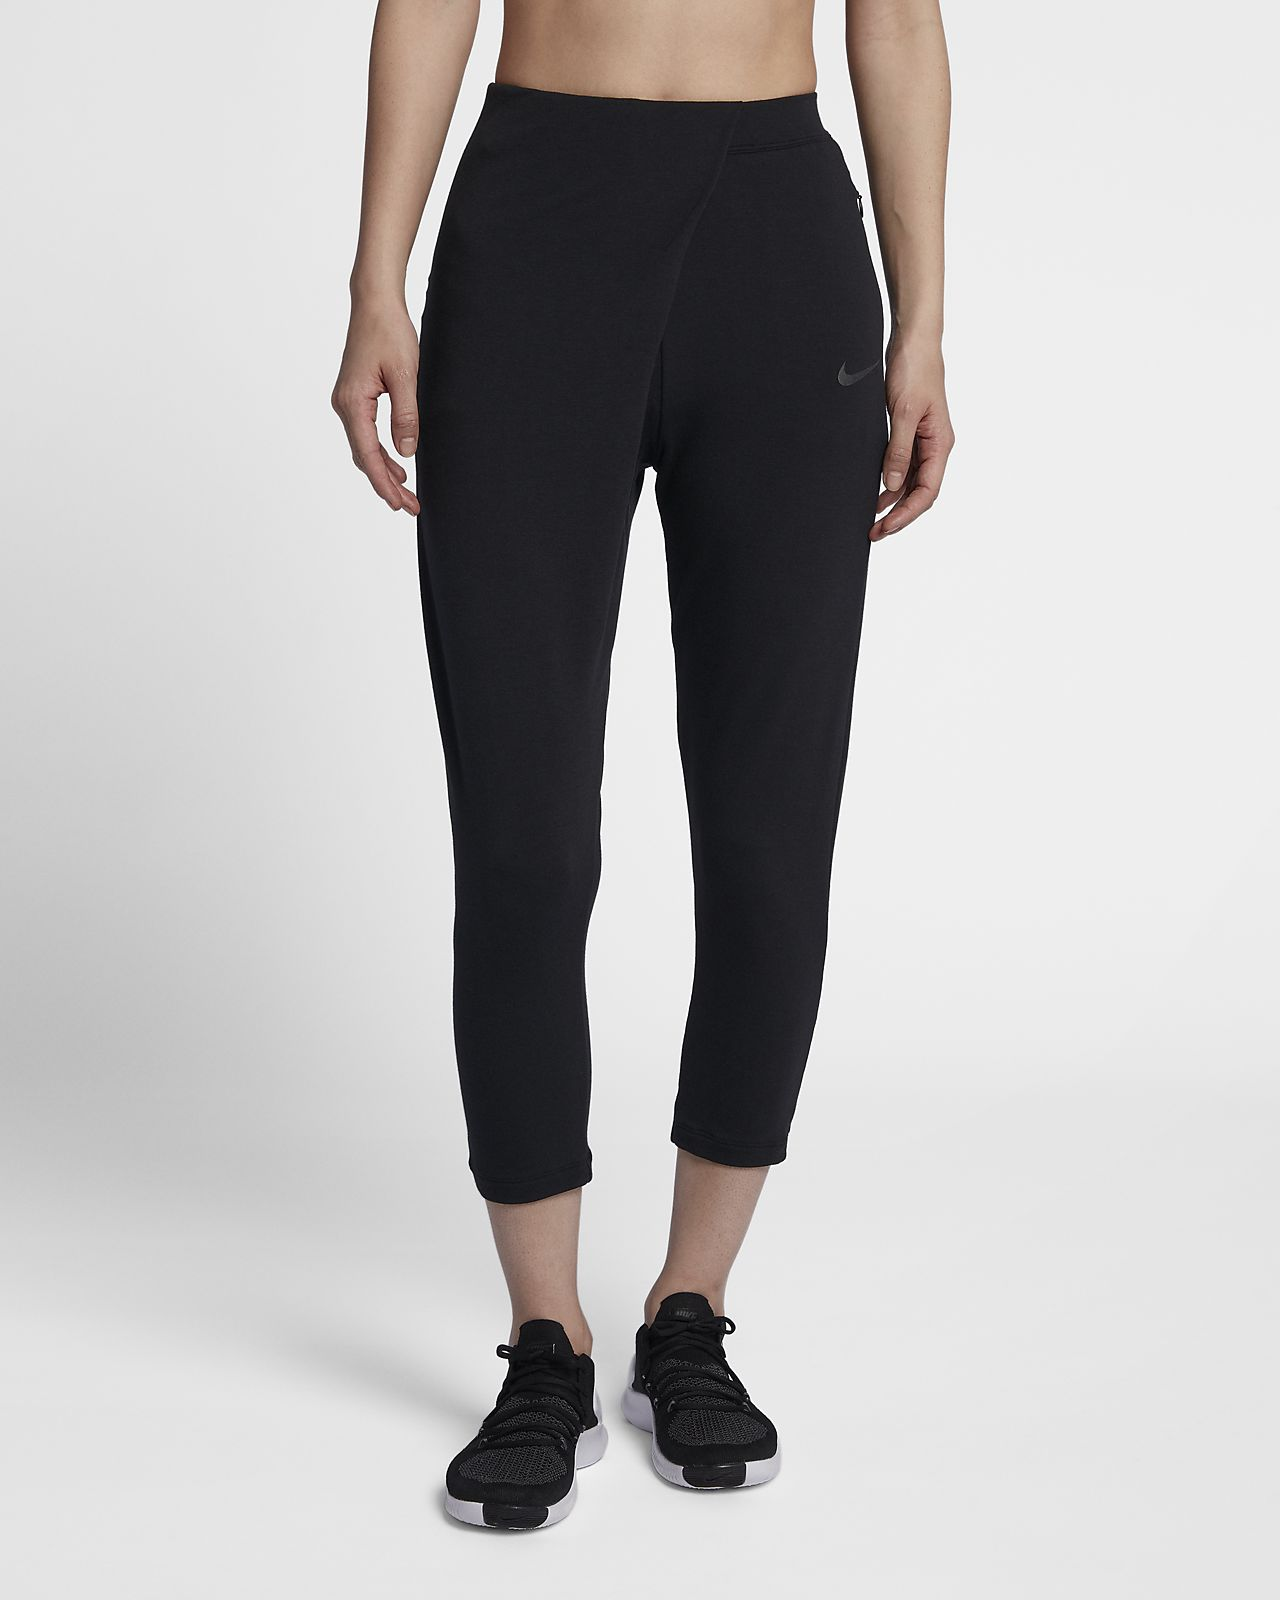 5cd997b6ee8 Nike Dri-FIT Studio Women s Mid-Rise Training Trousers. Nike.com CA